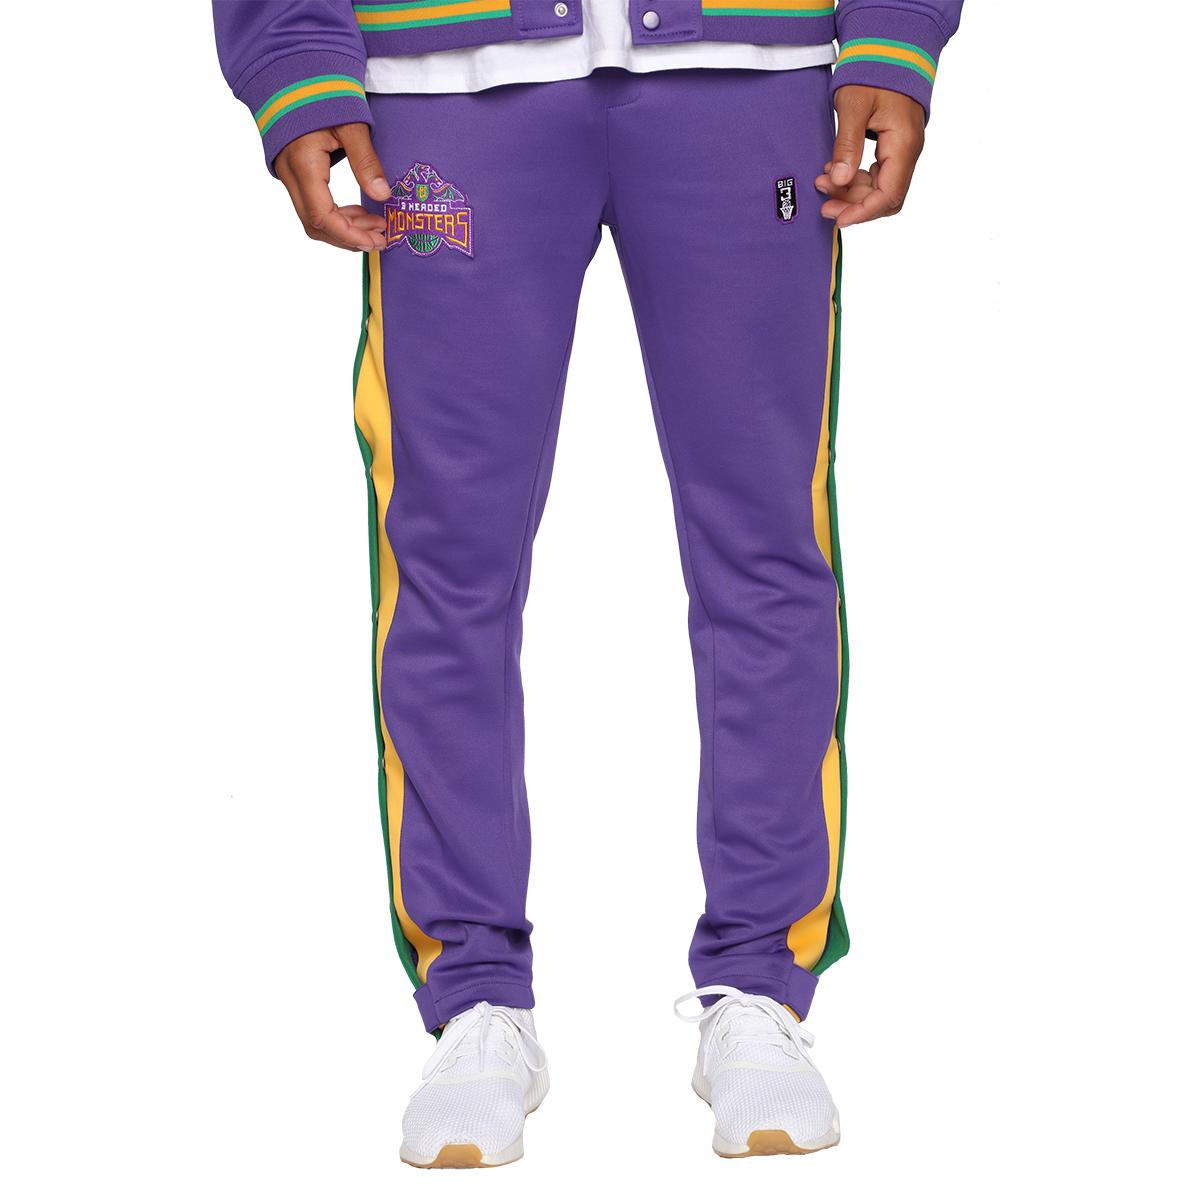 Team 3 Headed Monsters Joggers - Purple/Combo